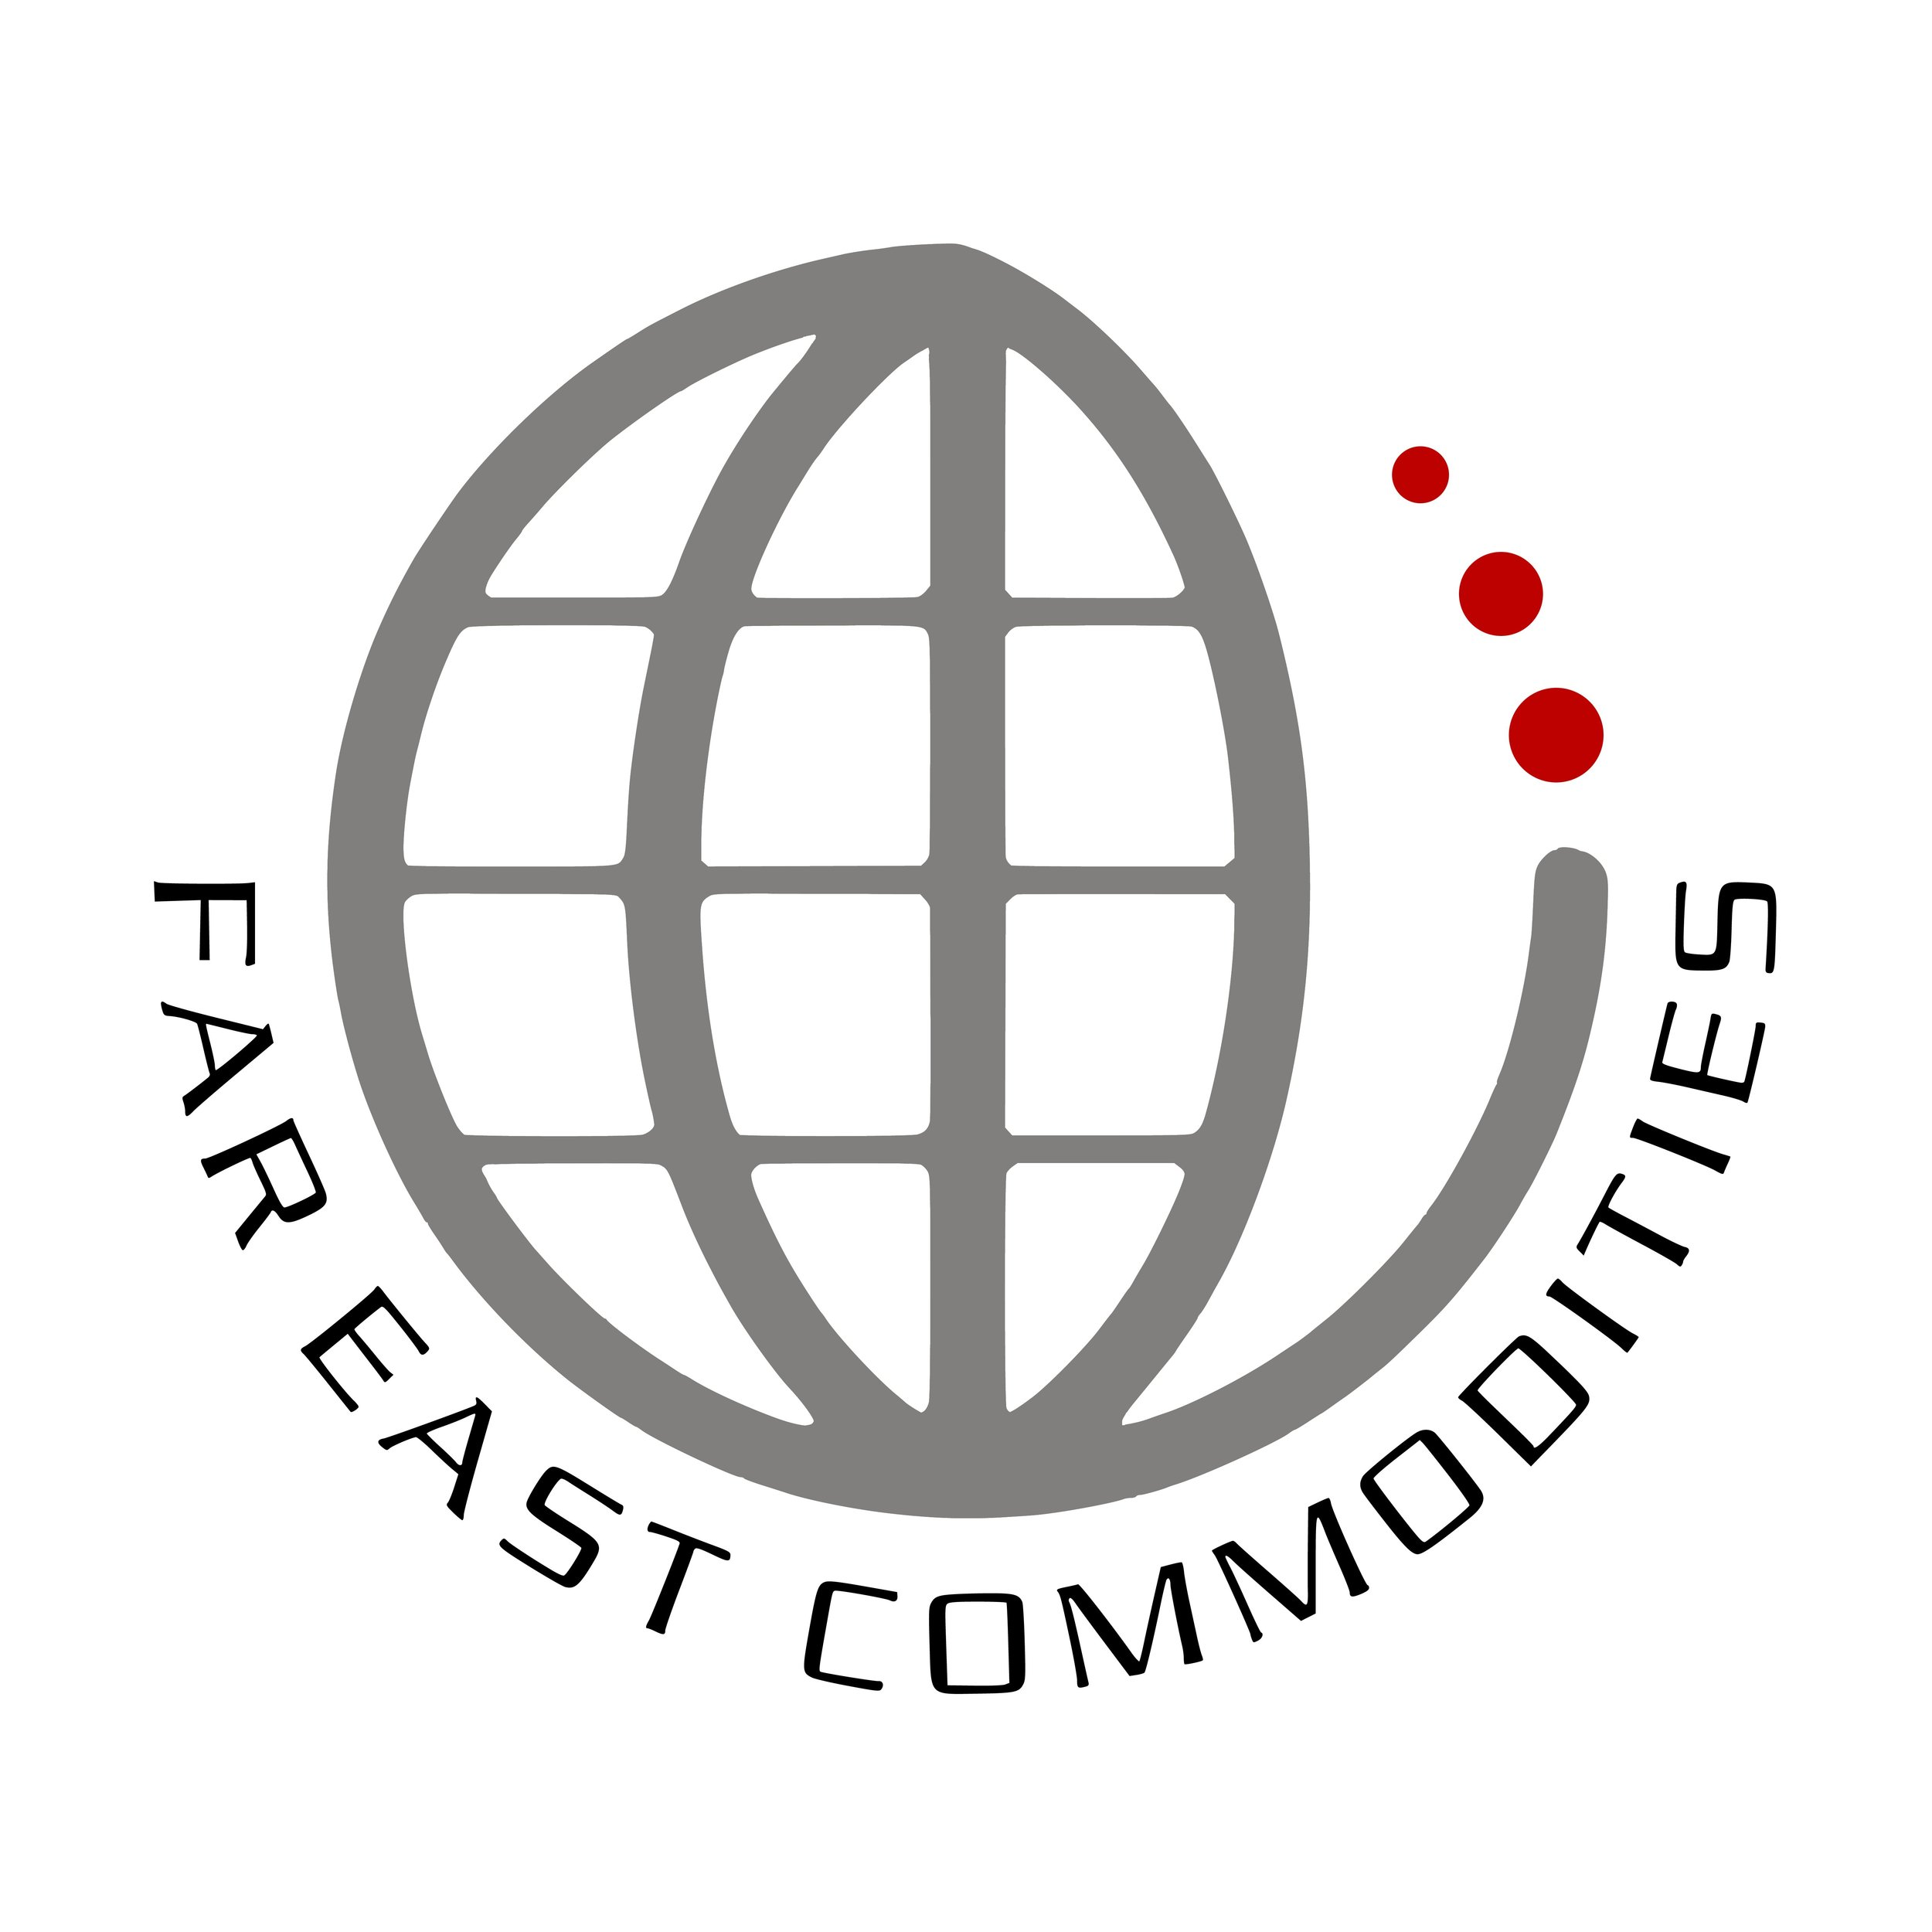 Far East Commodities.jpg